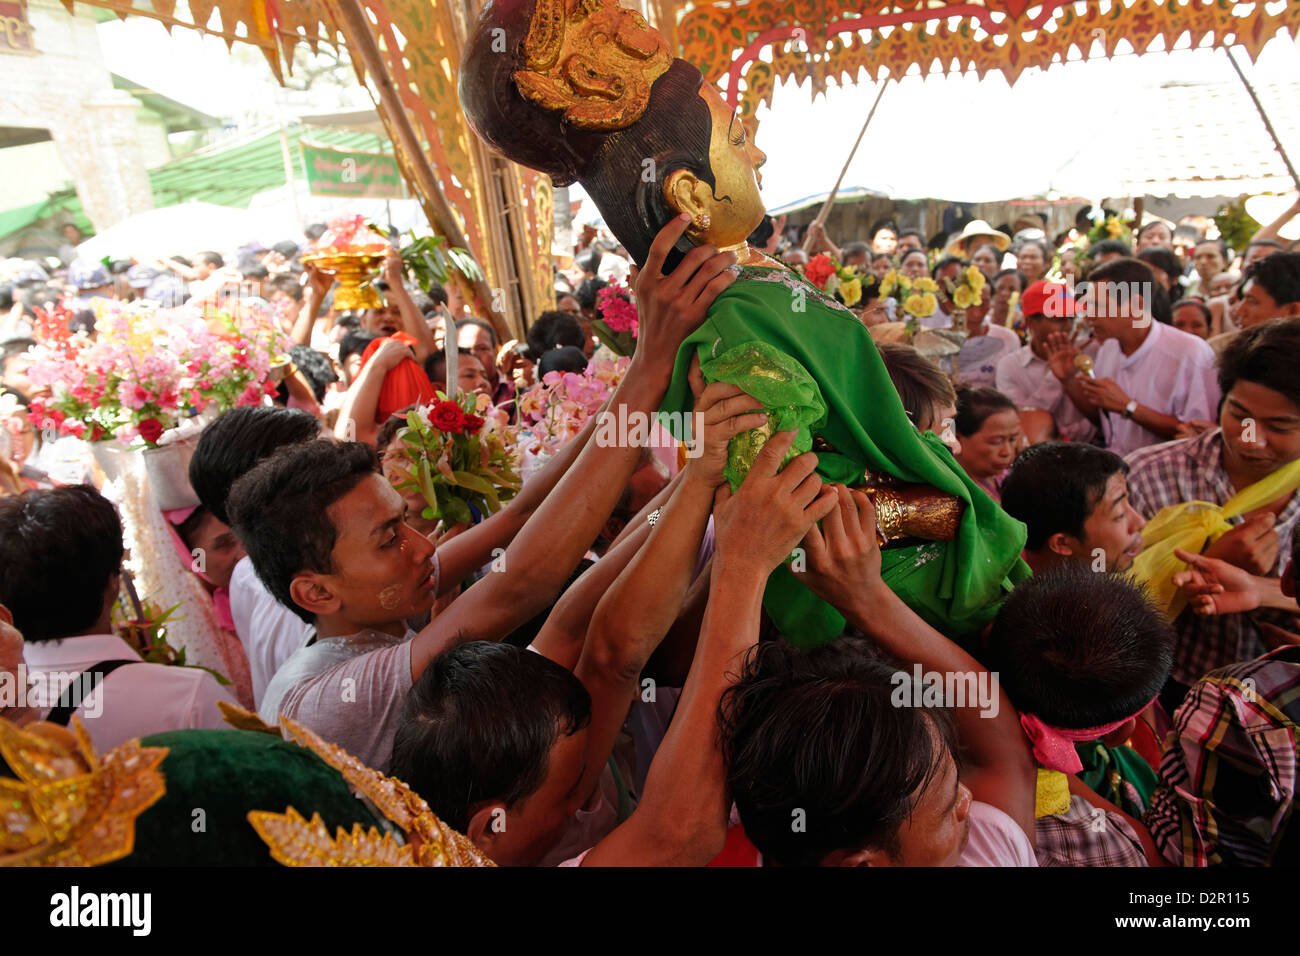 Ceremony of Washing the Nats' Statues, Yadanagu Nats Festival, Amarapura, Mandalay Division, Myanmar - Stock Image